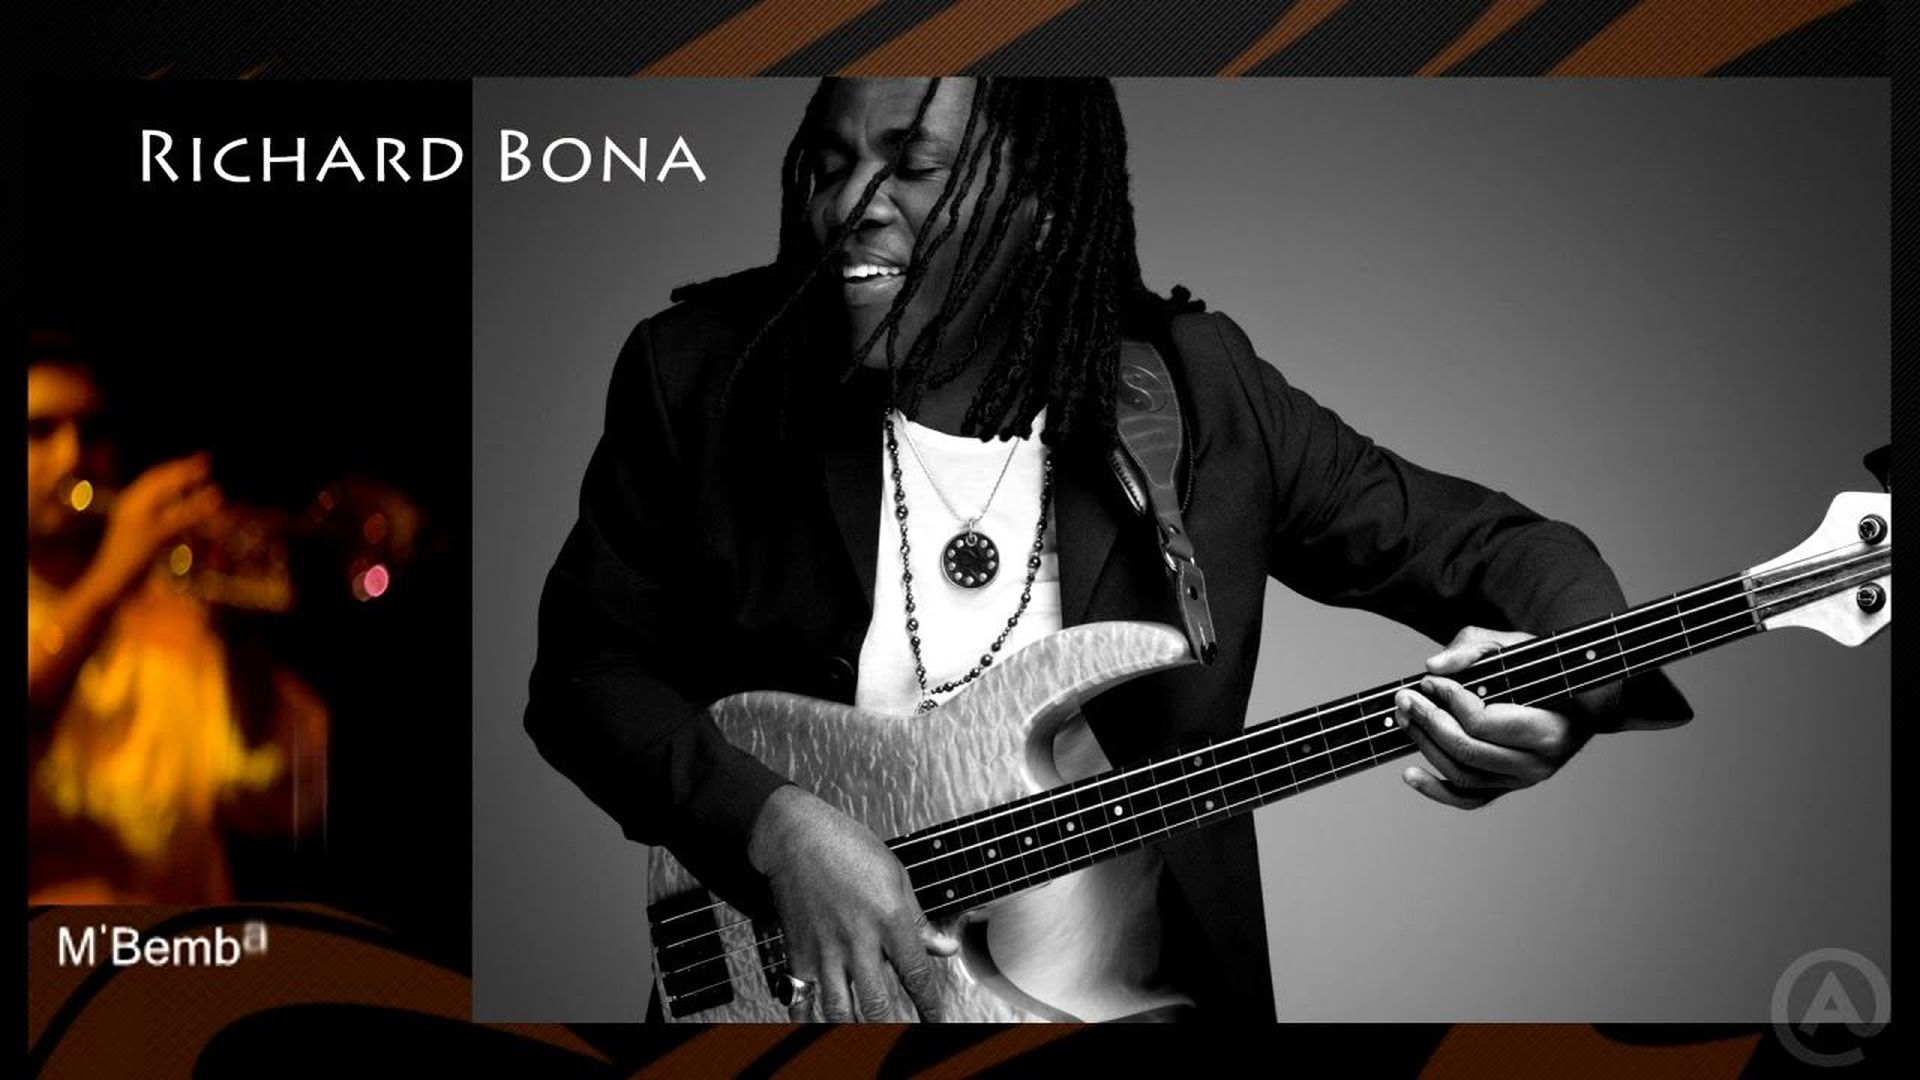 Richard Bona: Grammy Award-winning bass guitarist